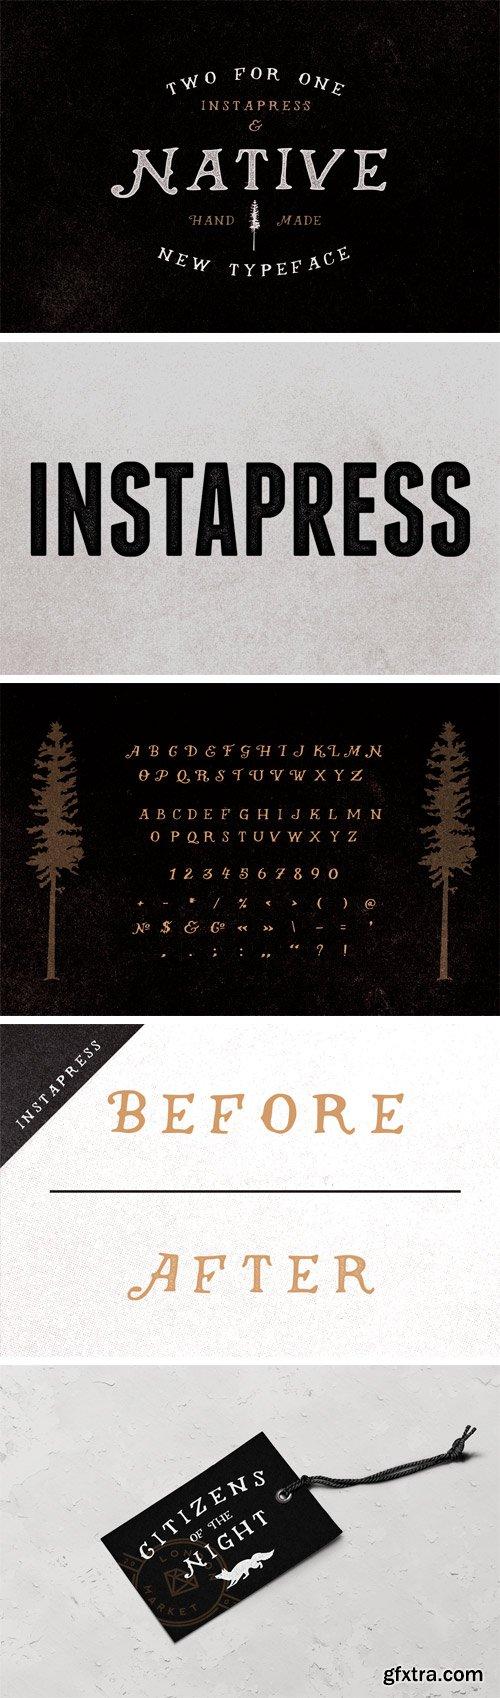 Native (+ Instapress) Font for $20